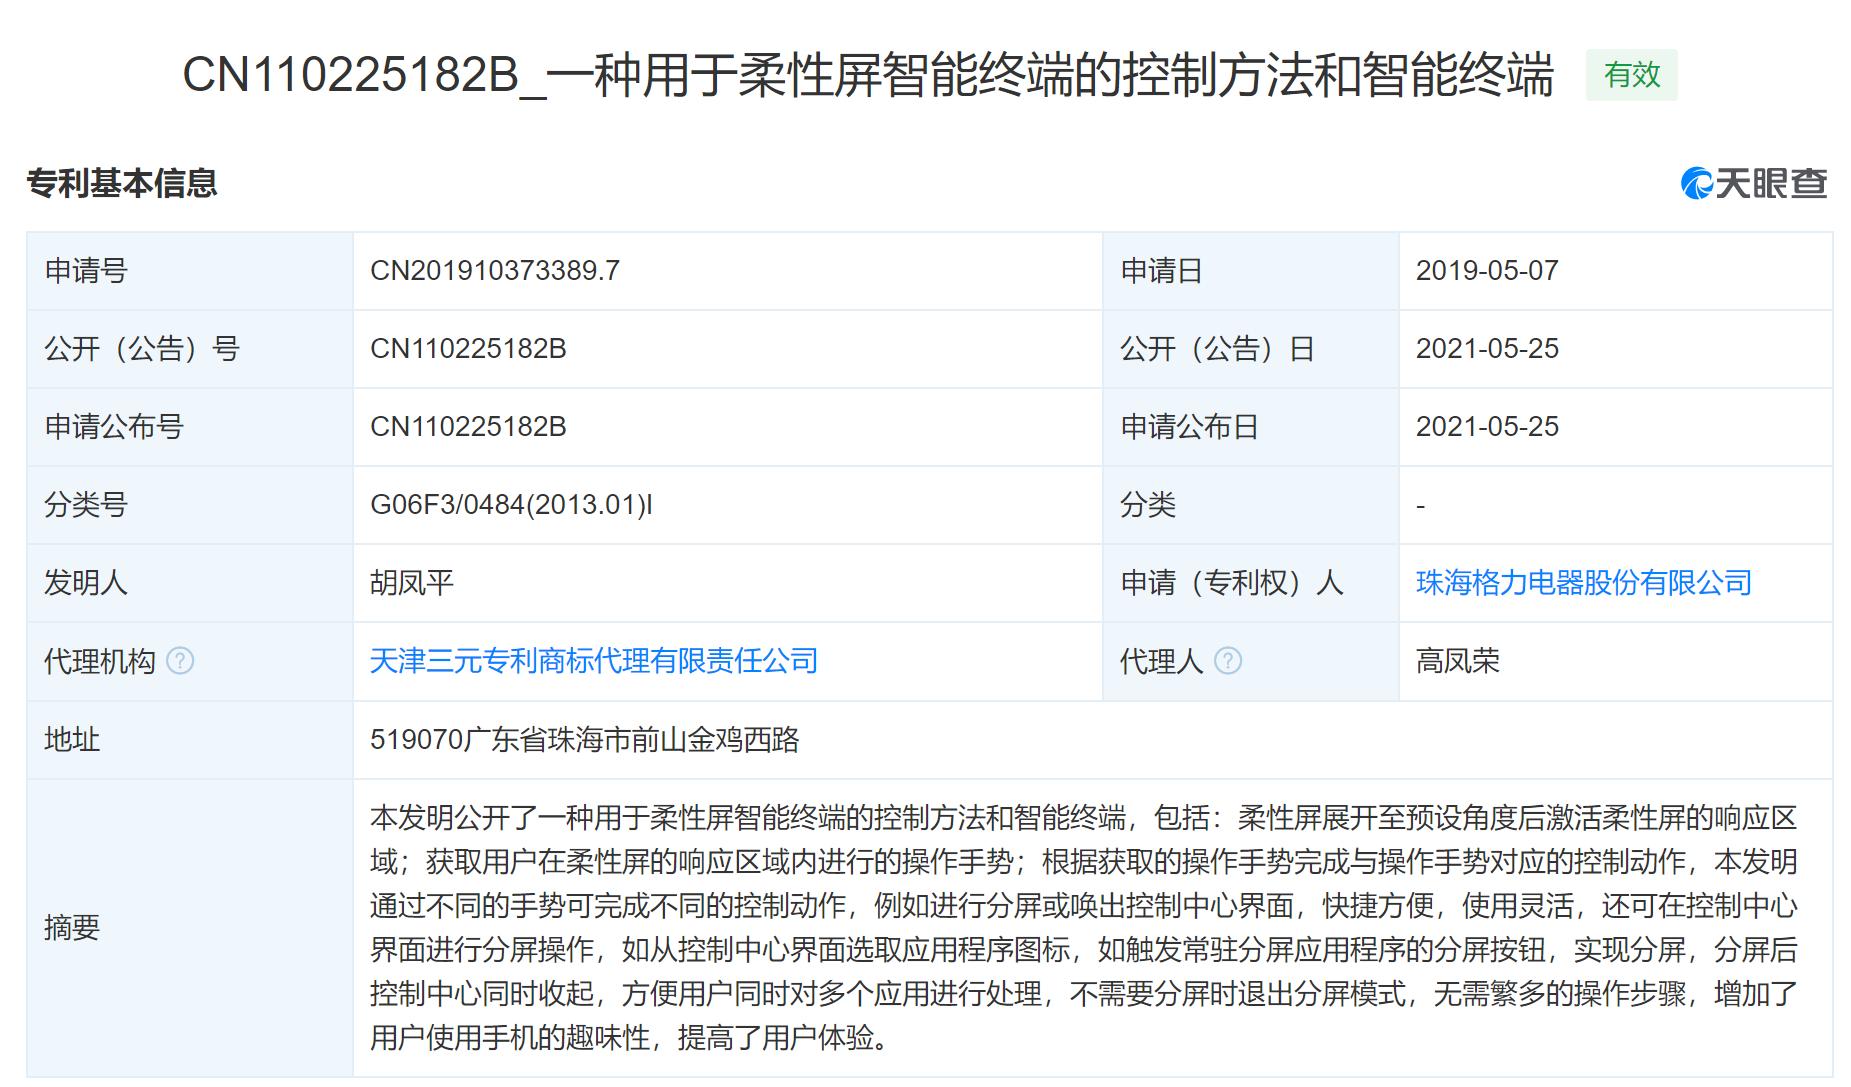 QQ截图20210525155503.png